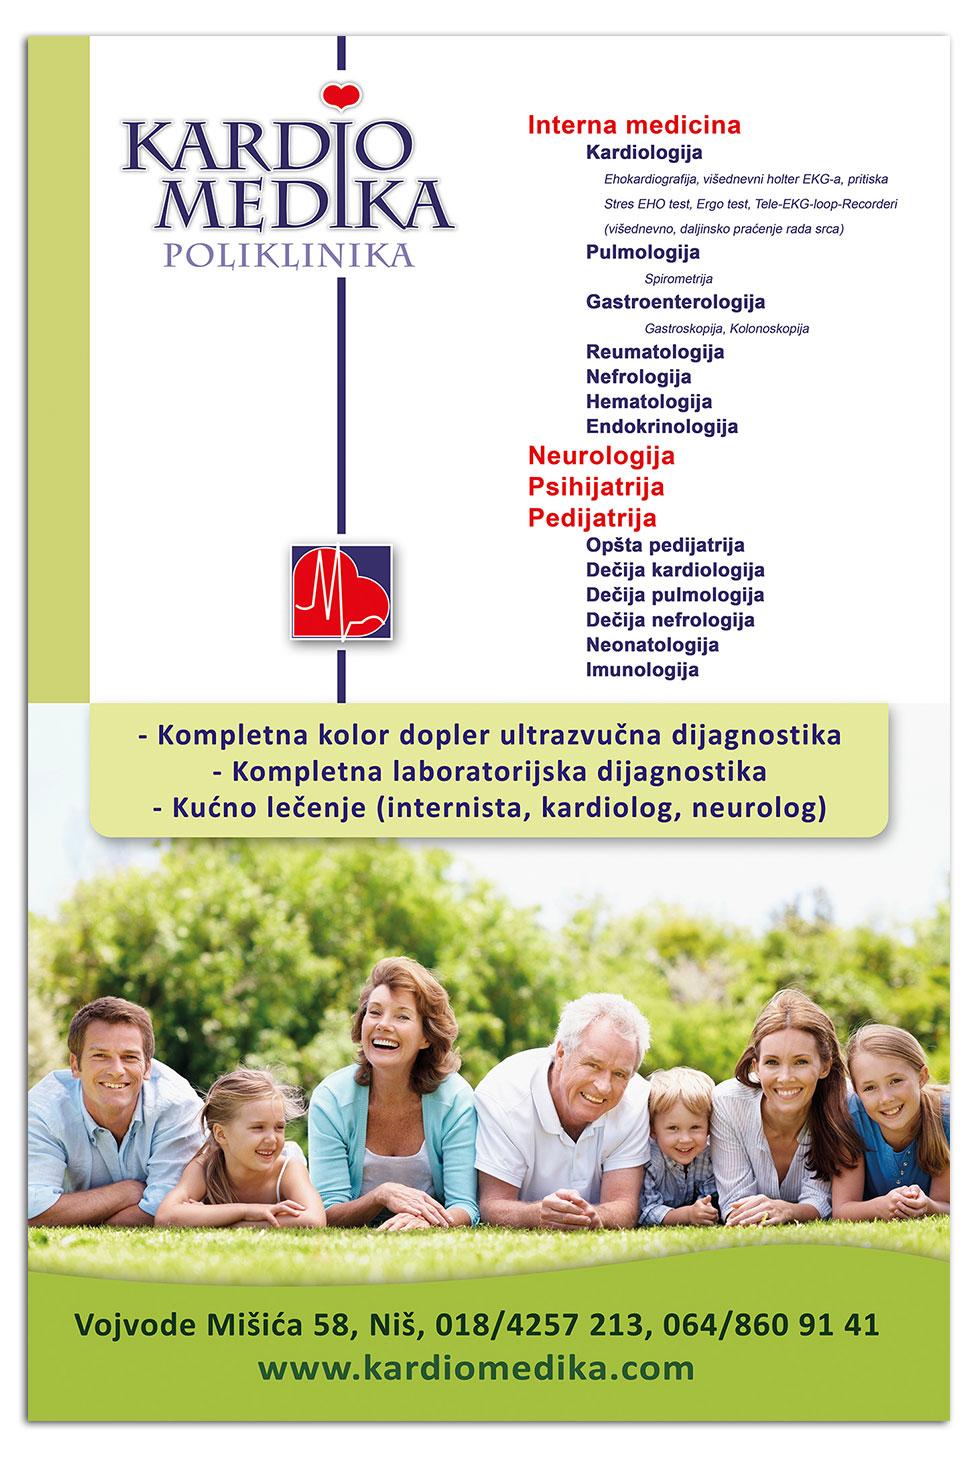 kardiomedica poster 2